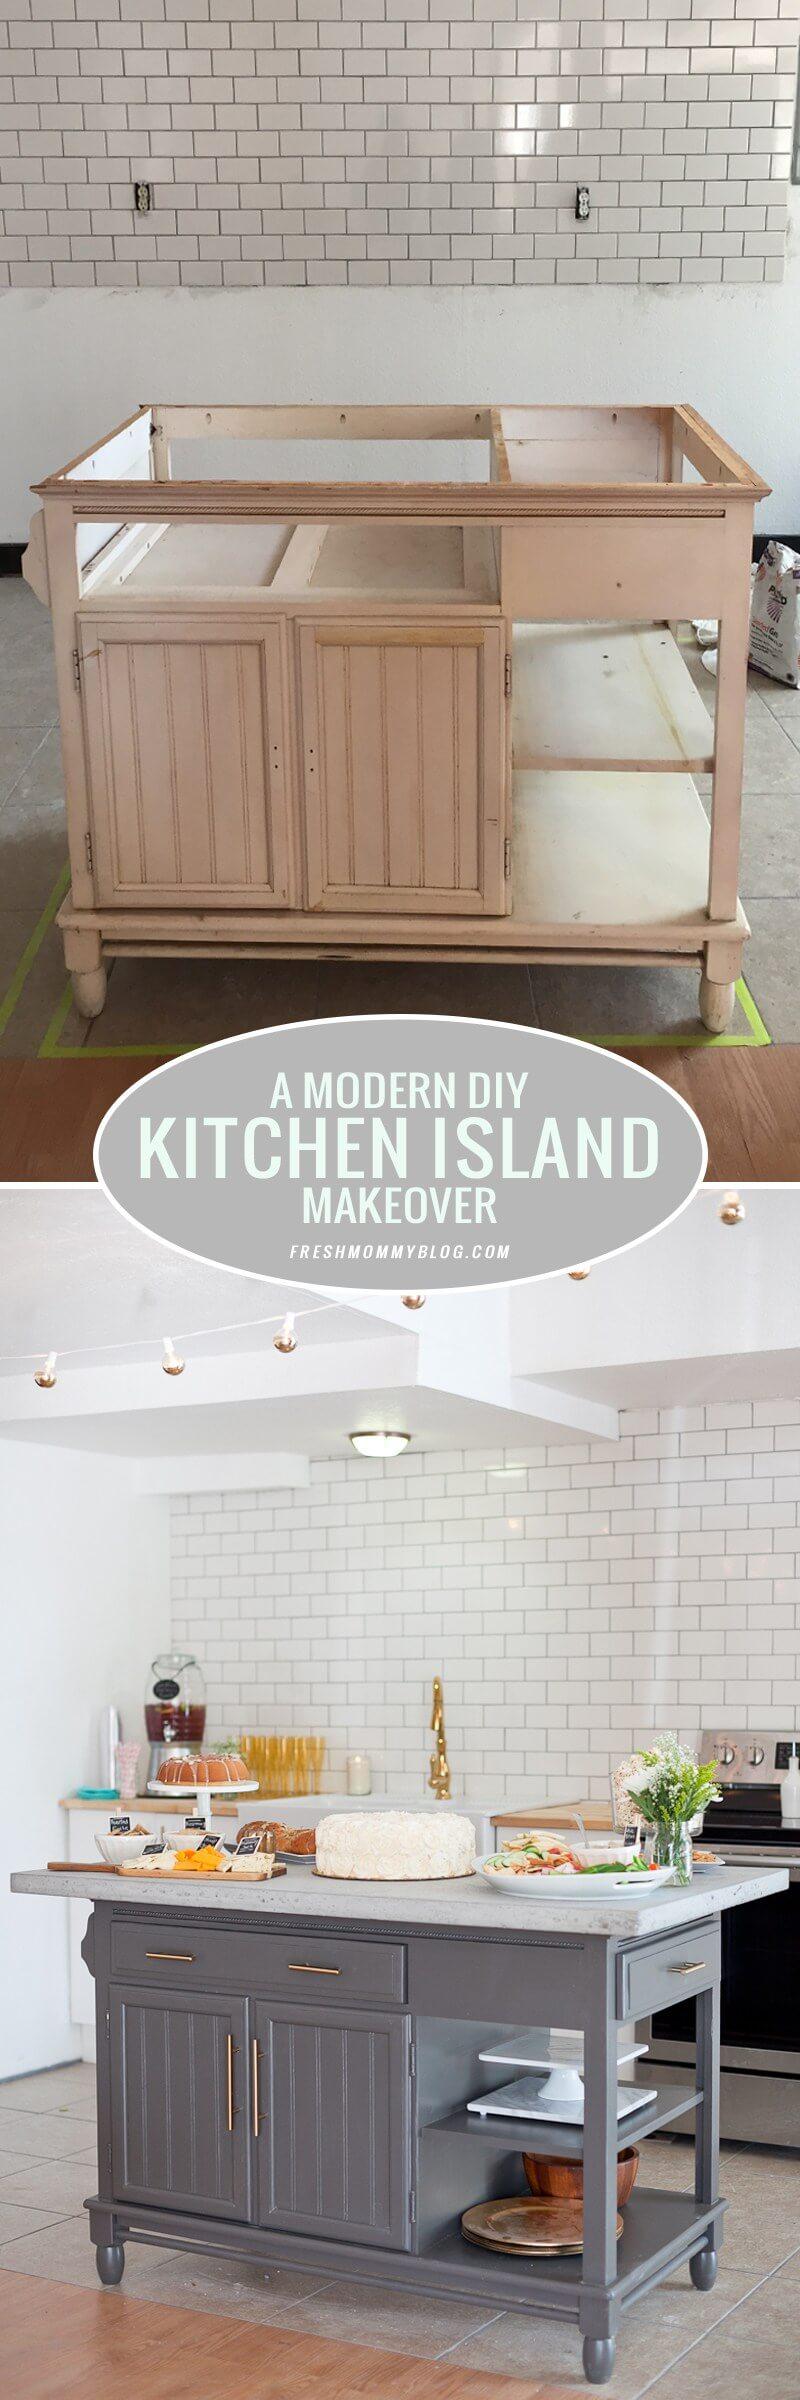 DIY kitchen island! 17 original ideas to inspire you ...